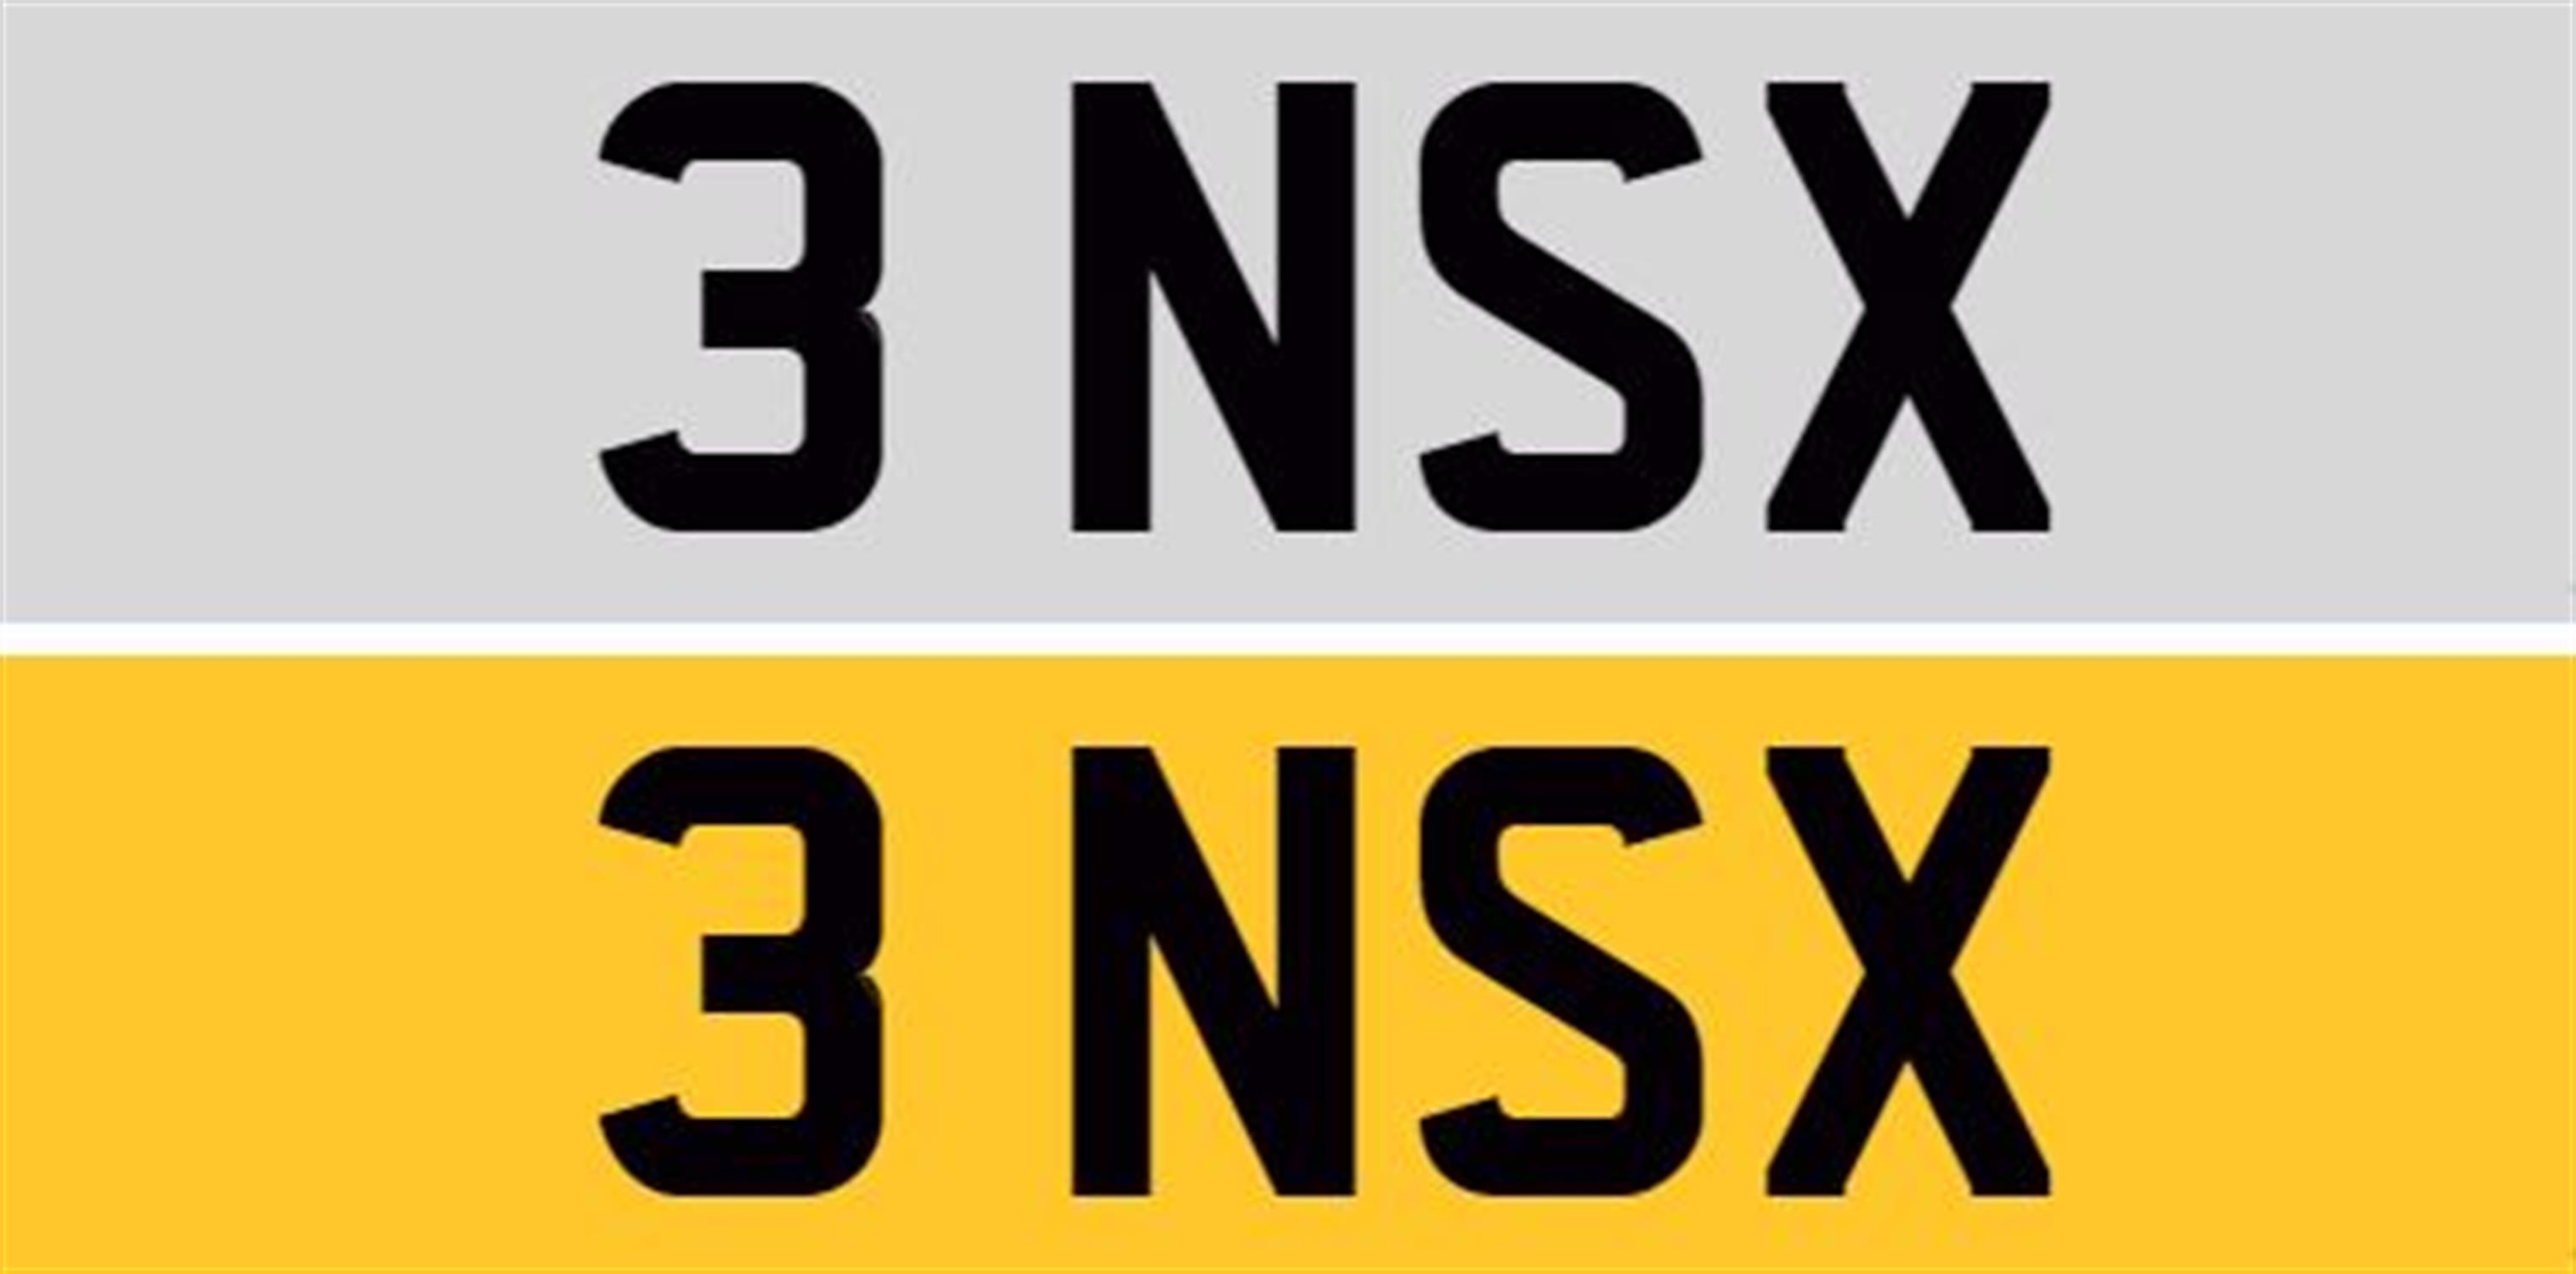 Registration Number 3 NSX and Custom-Made Number Plates